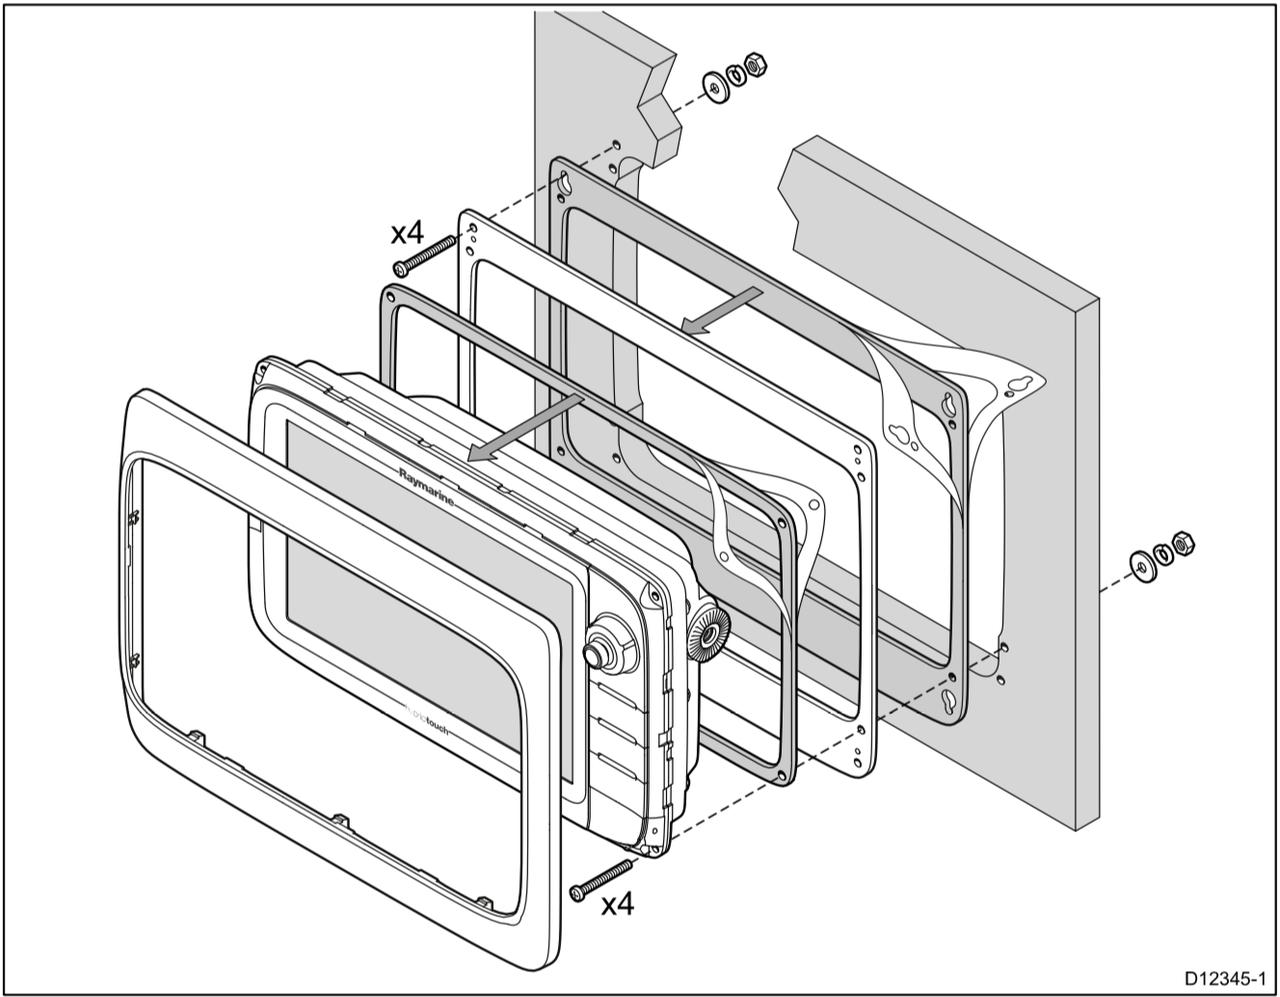 Garmin Network Cable Wiring Diagram 5212 2010c Sensor Usb